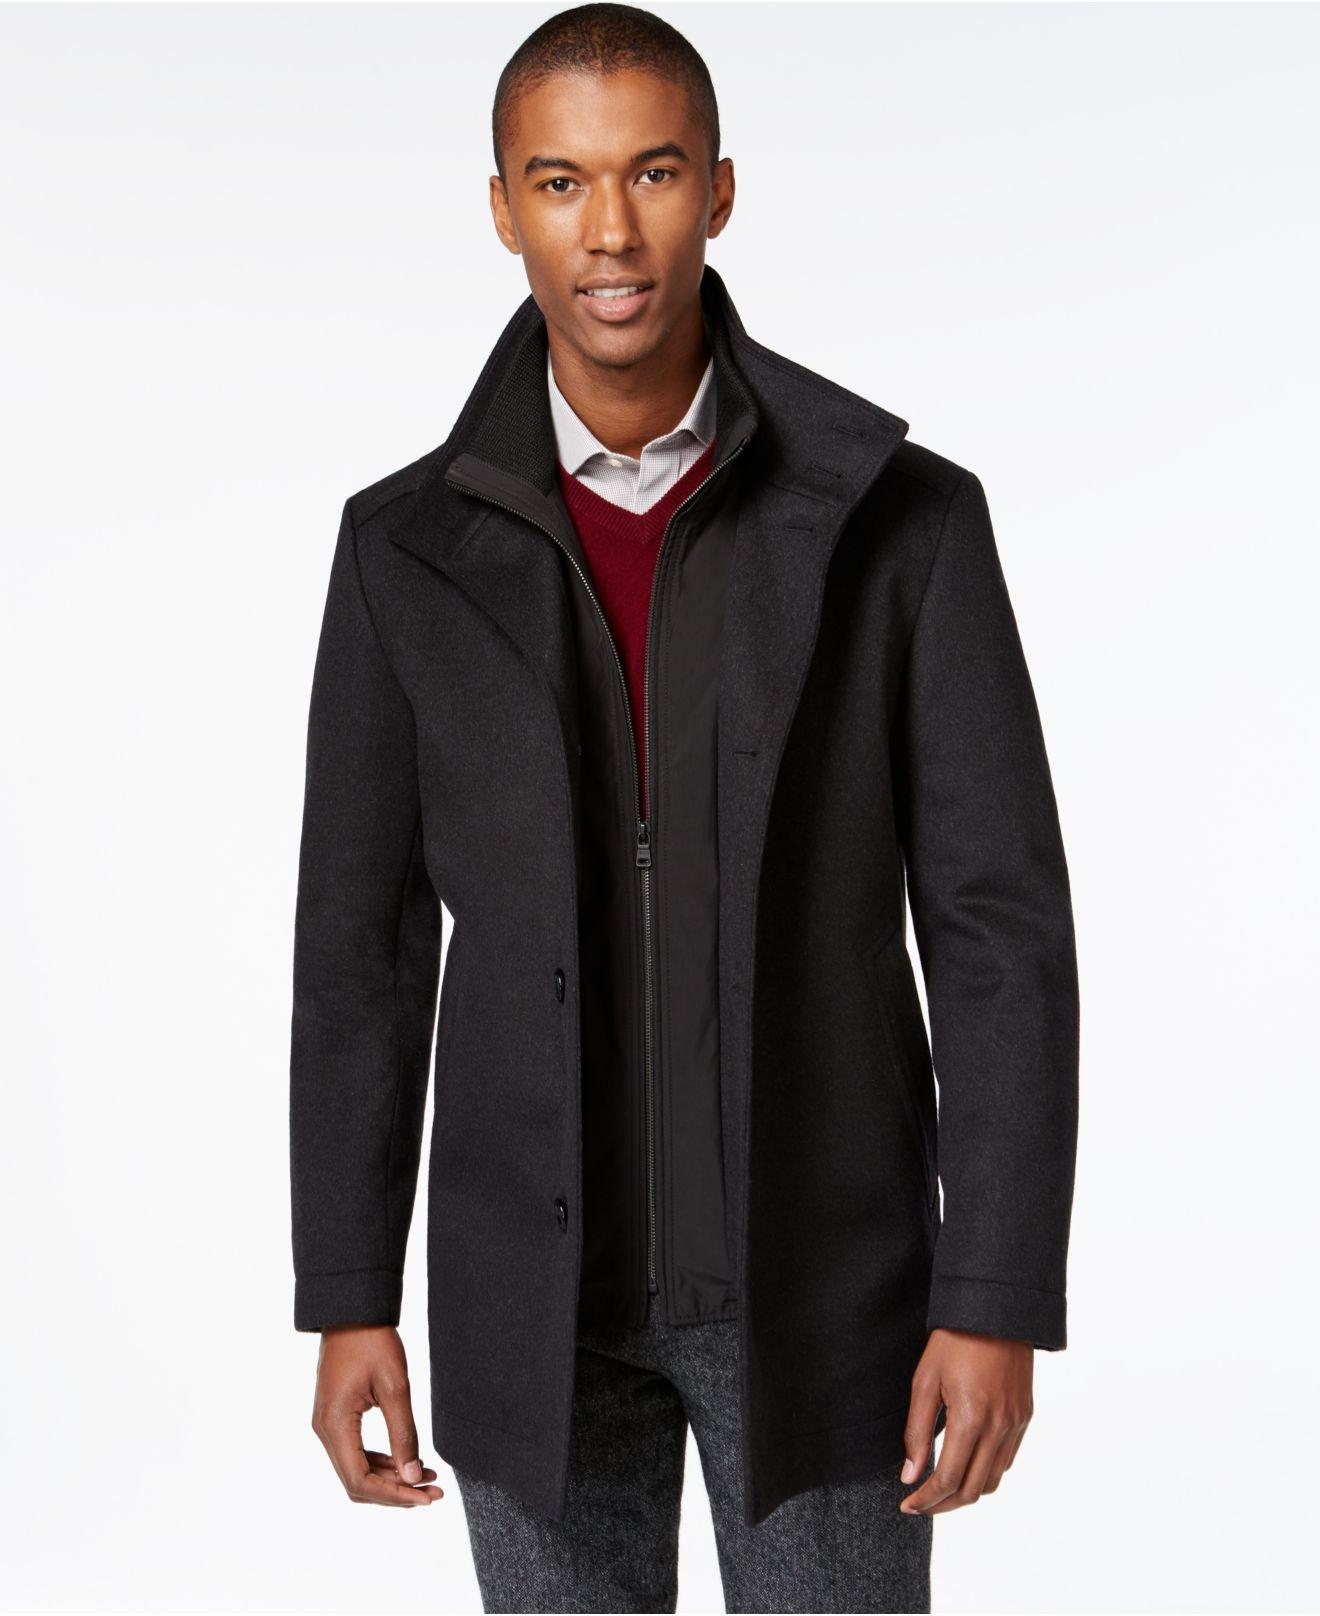 saks fifth avenue hugo boss mens winter coats. Black Bedroom Furniture Sets. Home Design Ideas